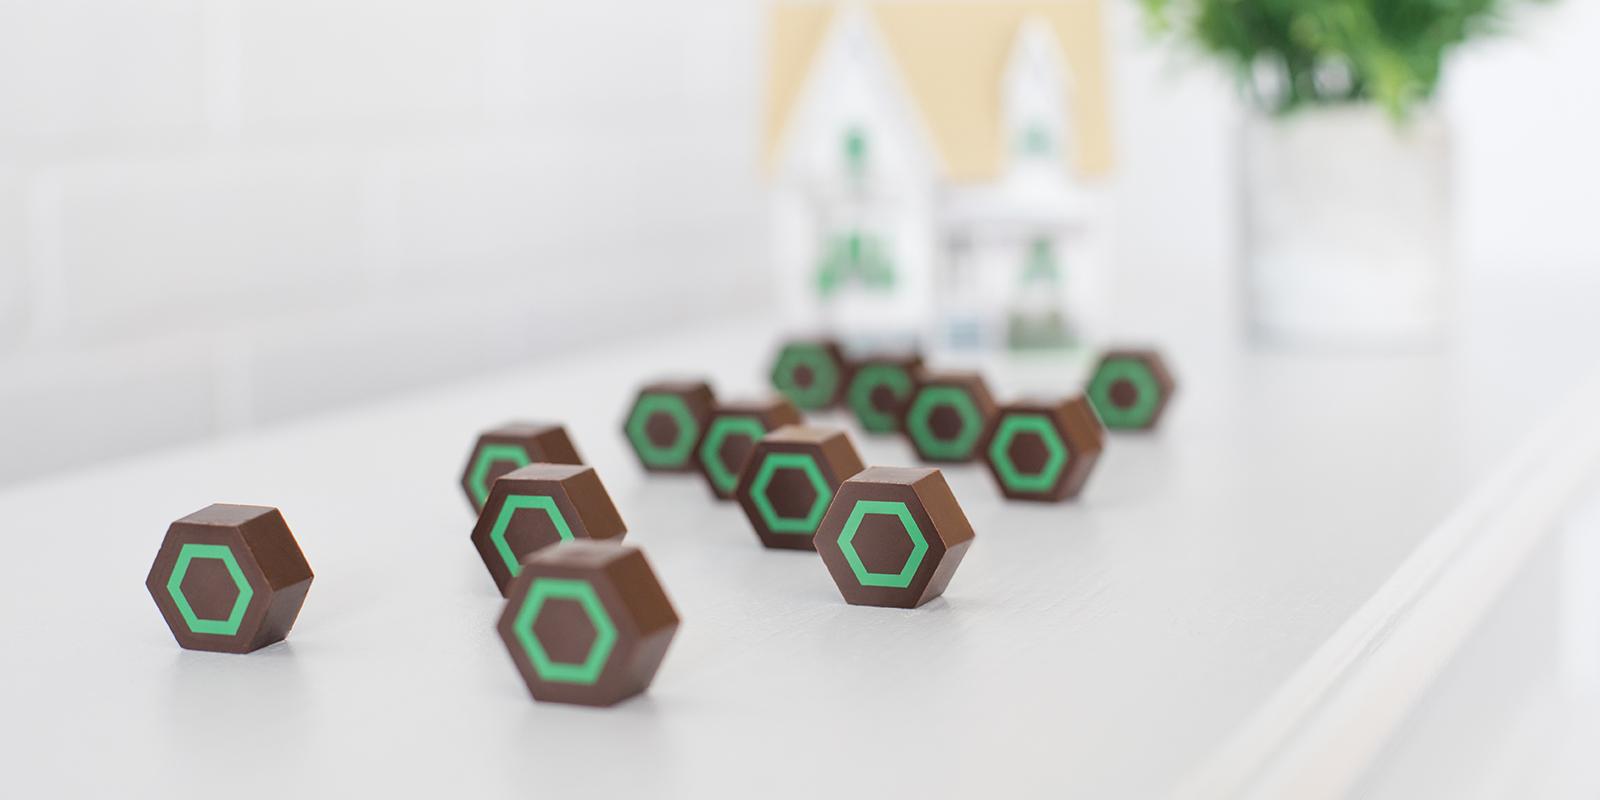 ChocoChocolat_Header_1600x800-CadeauxCorpo1